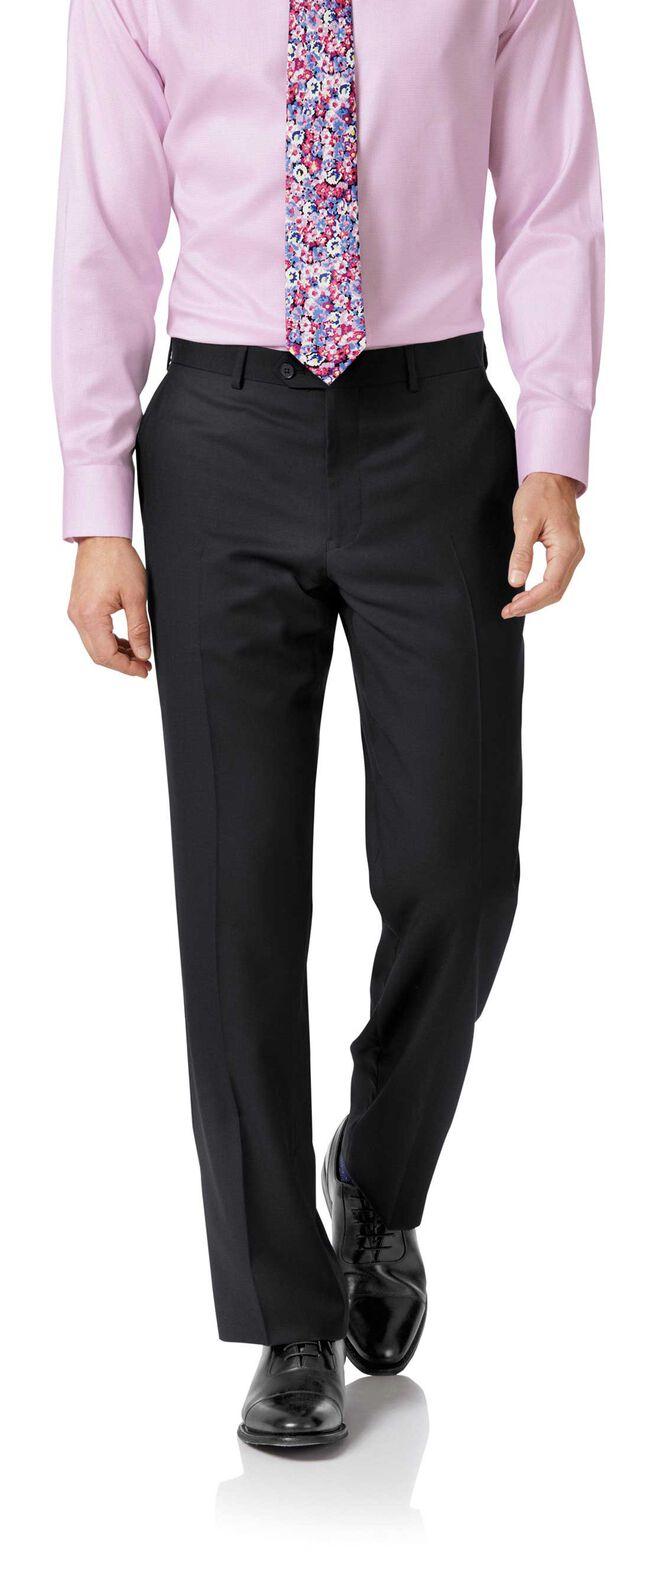 Black twill classic fit business suit